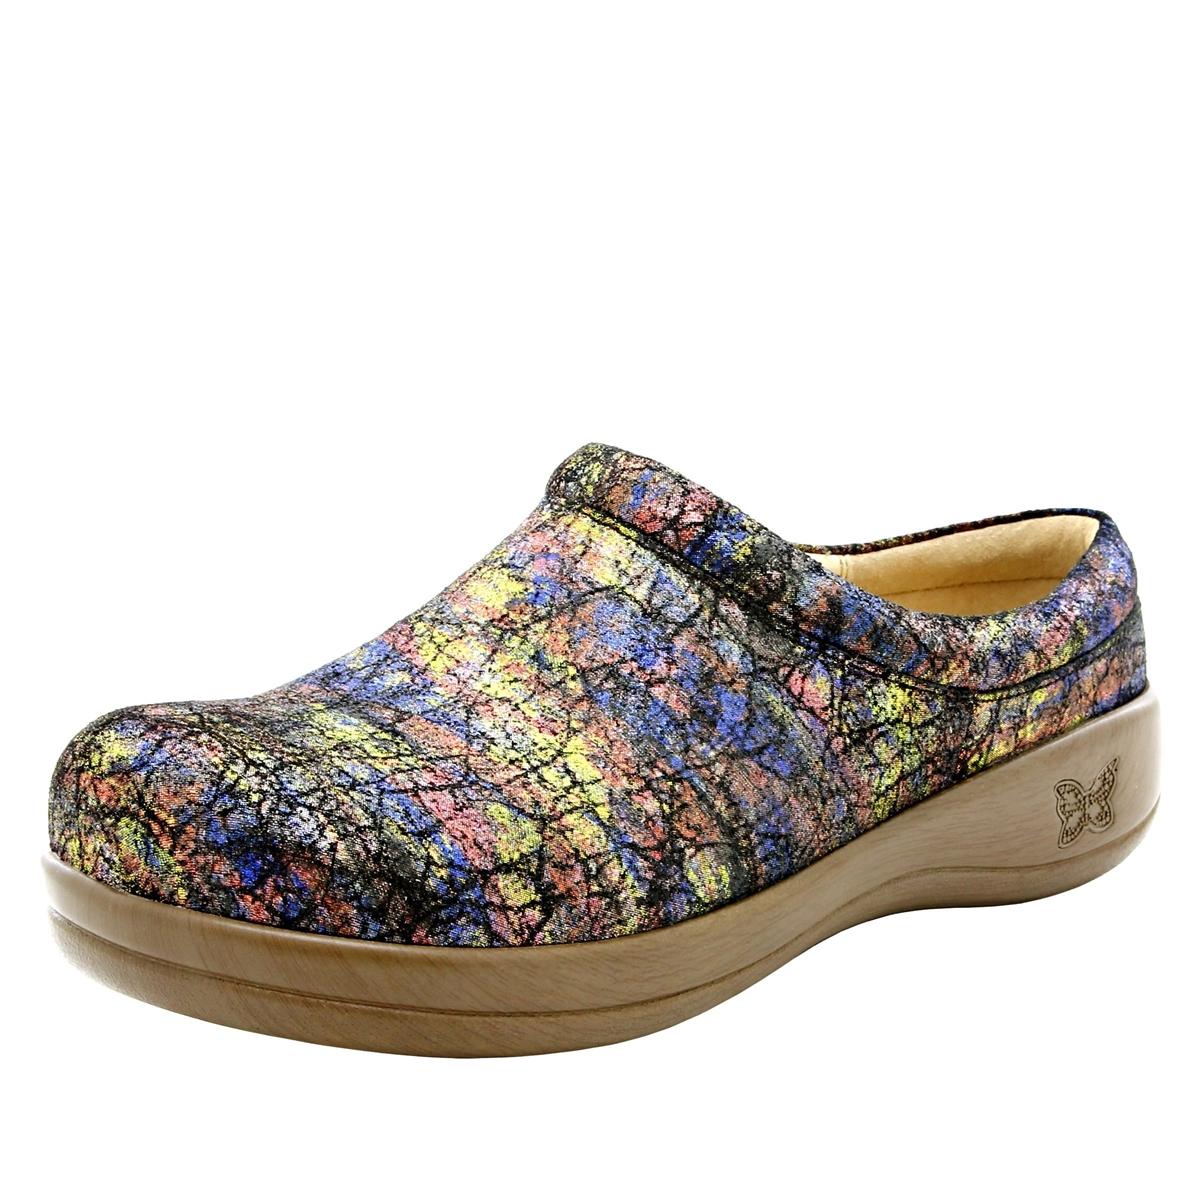 Alegria Shoes - Kayla Sierra